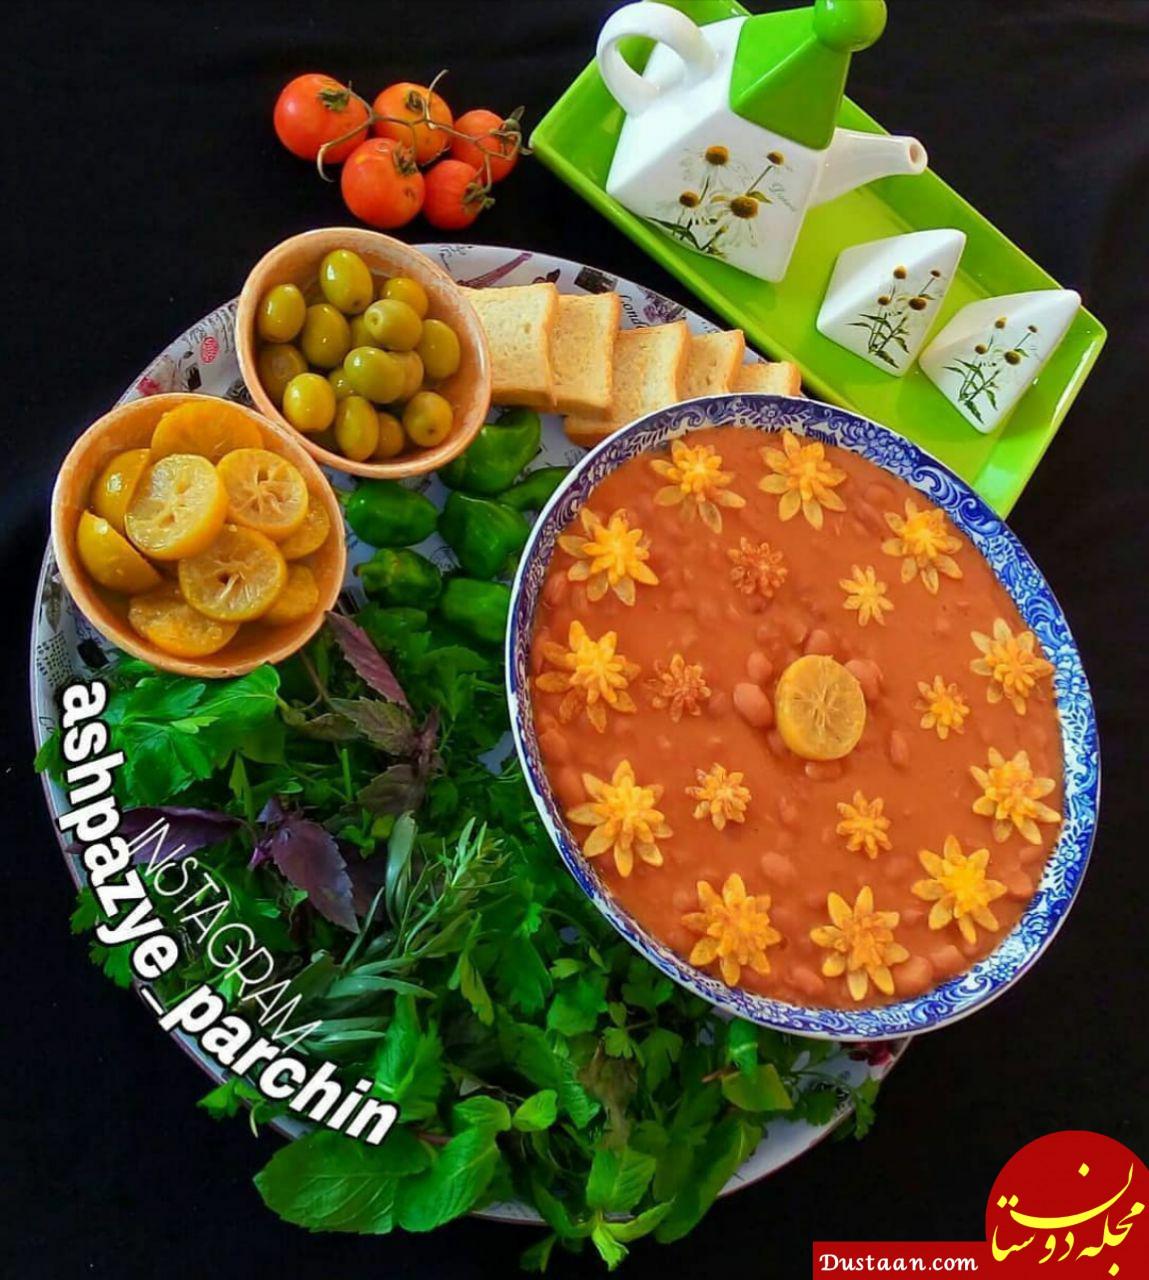 www.dustaan.com طرز تهیه خوراک لوبیا و قارچ به سبکی خوشمزه و آسان